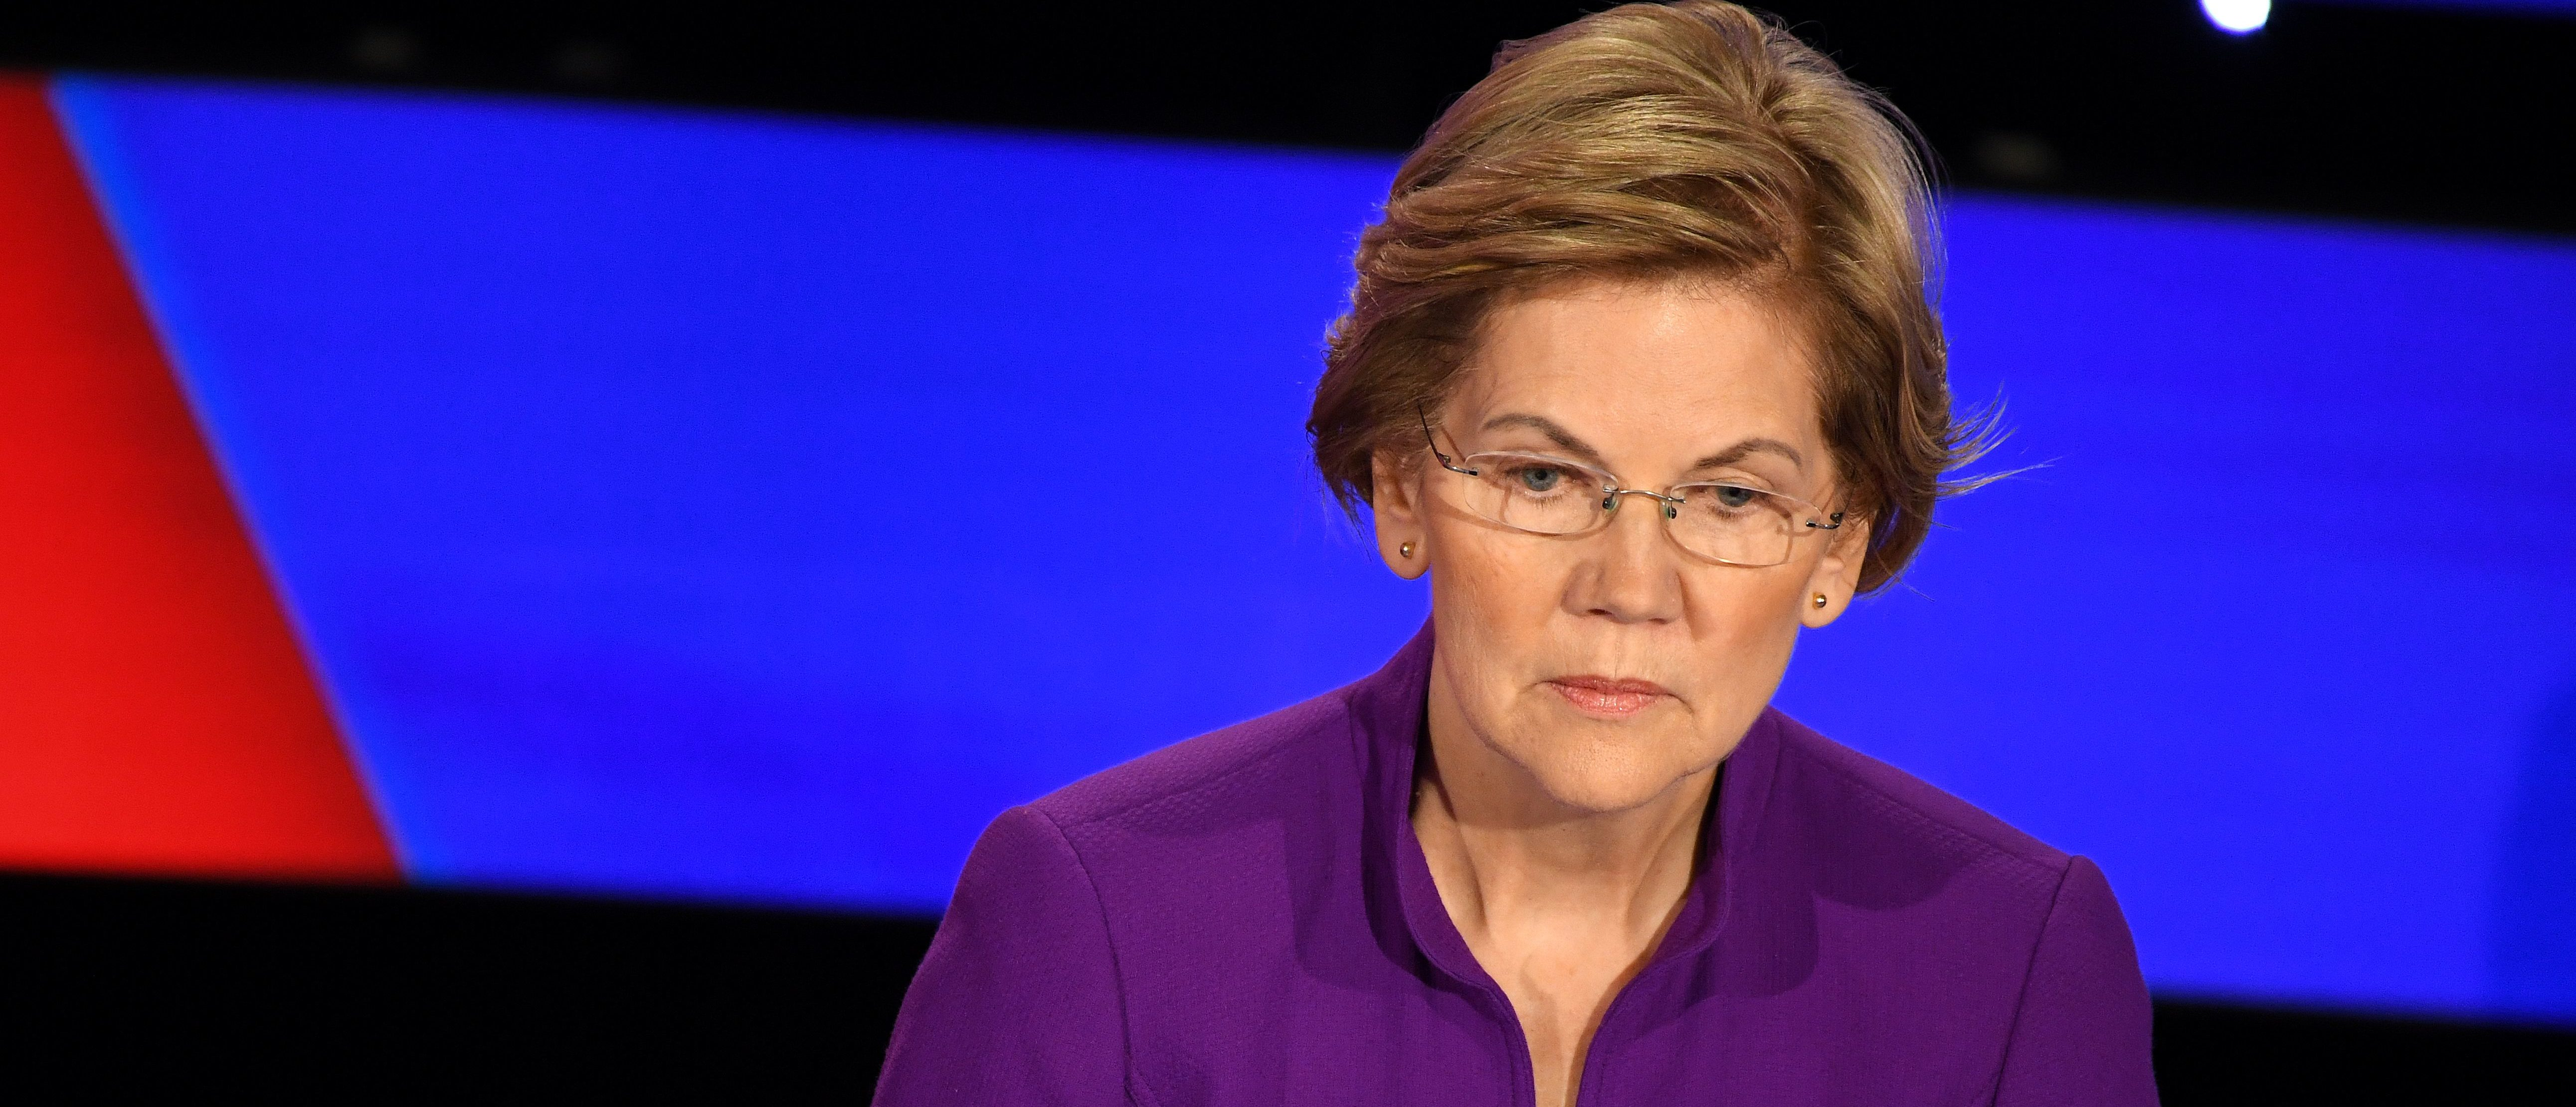 Analysis: Elizabeth Warren Has A Credibility Problem